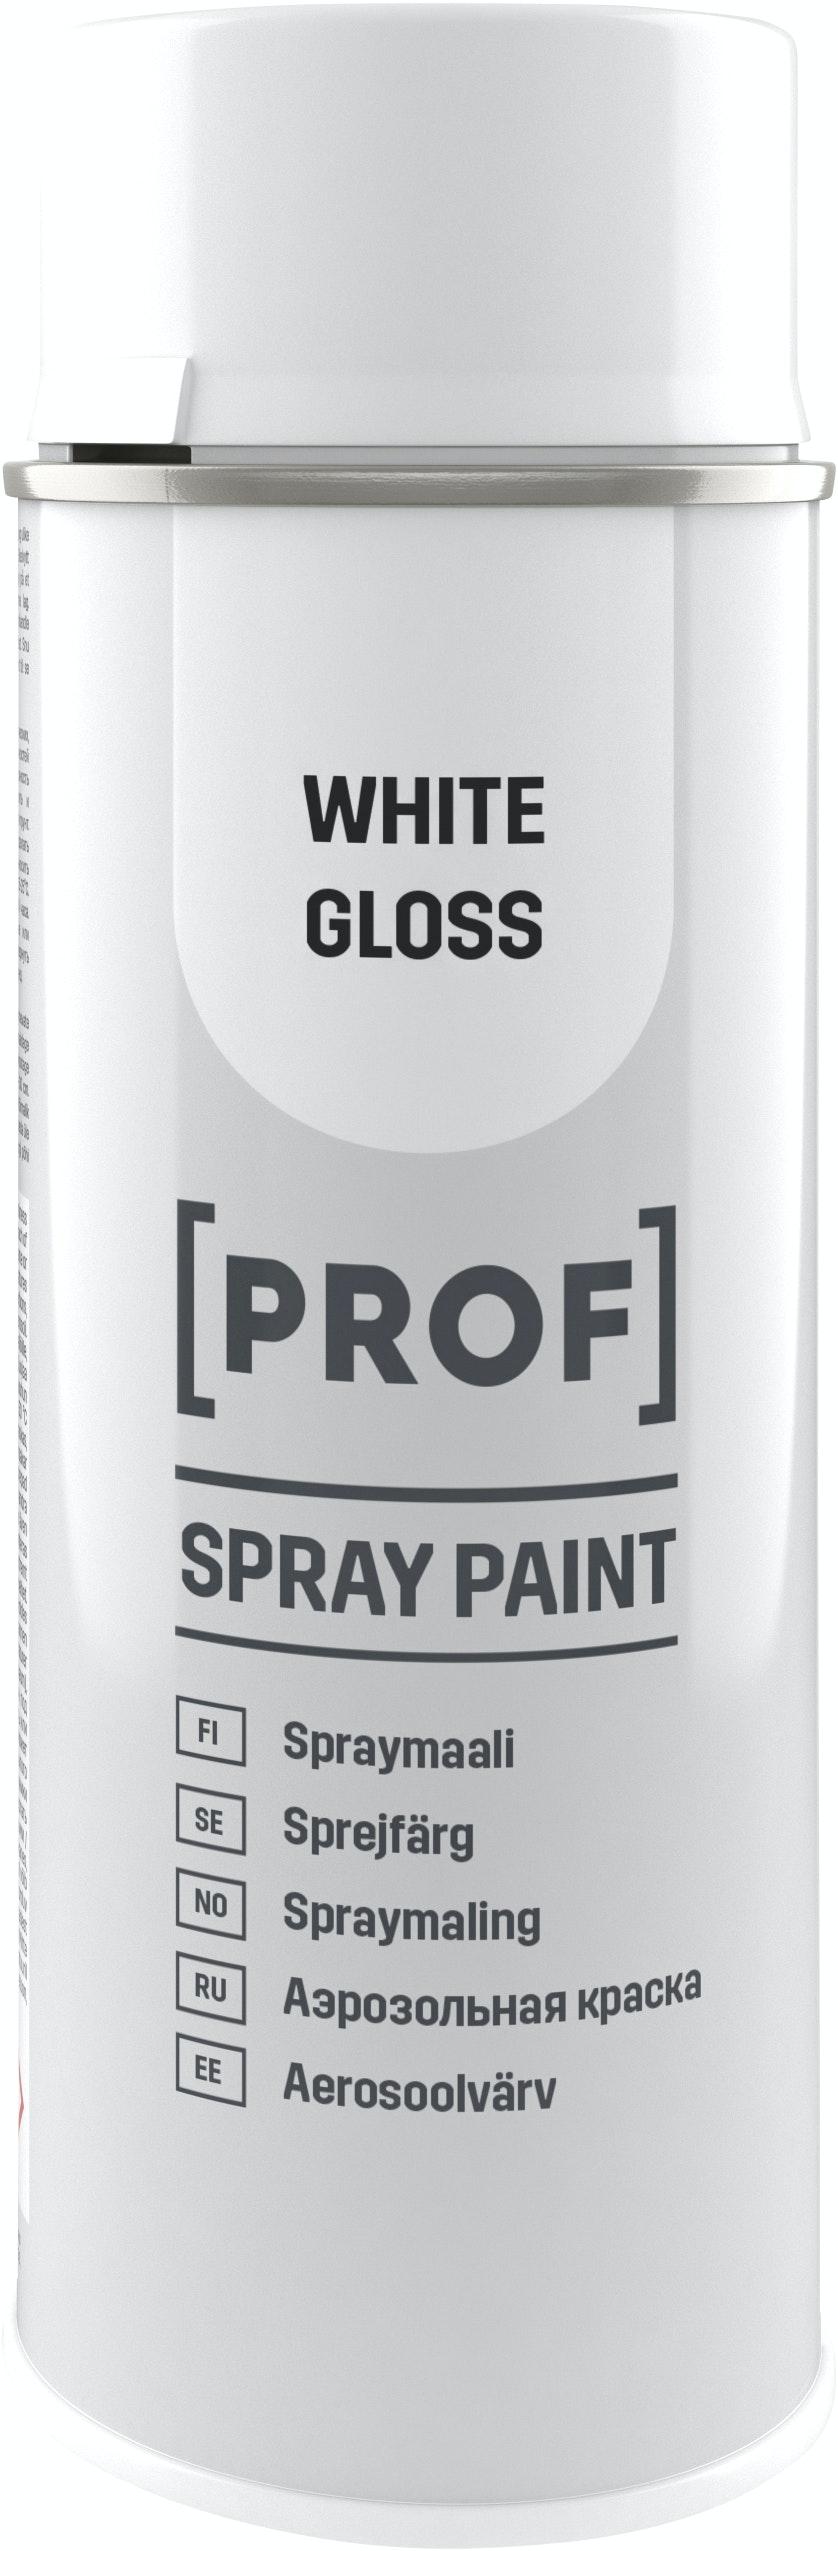 Sprayfärg Prof Professional Högblank Vit 400ml